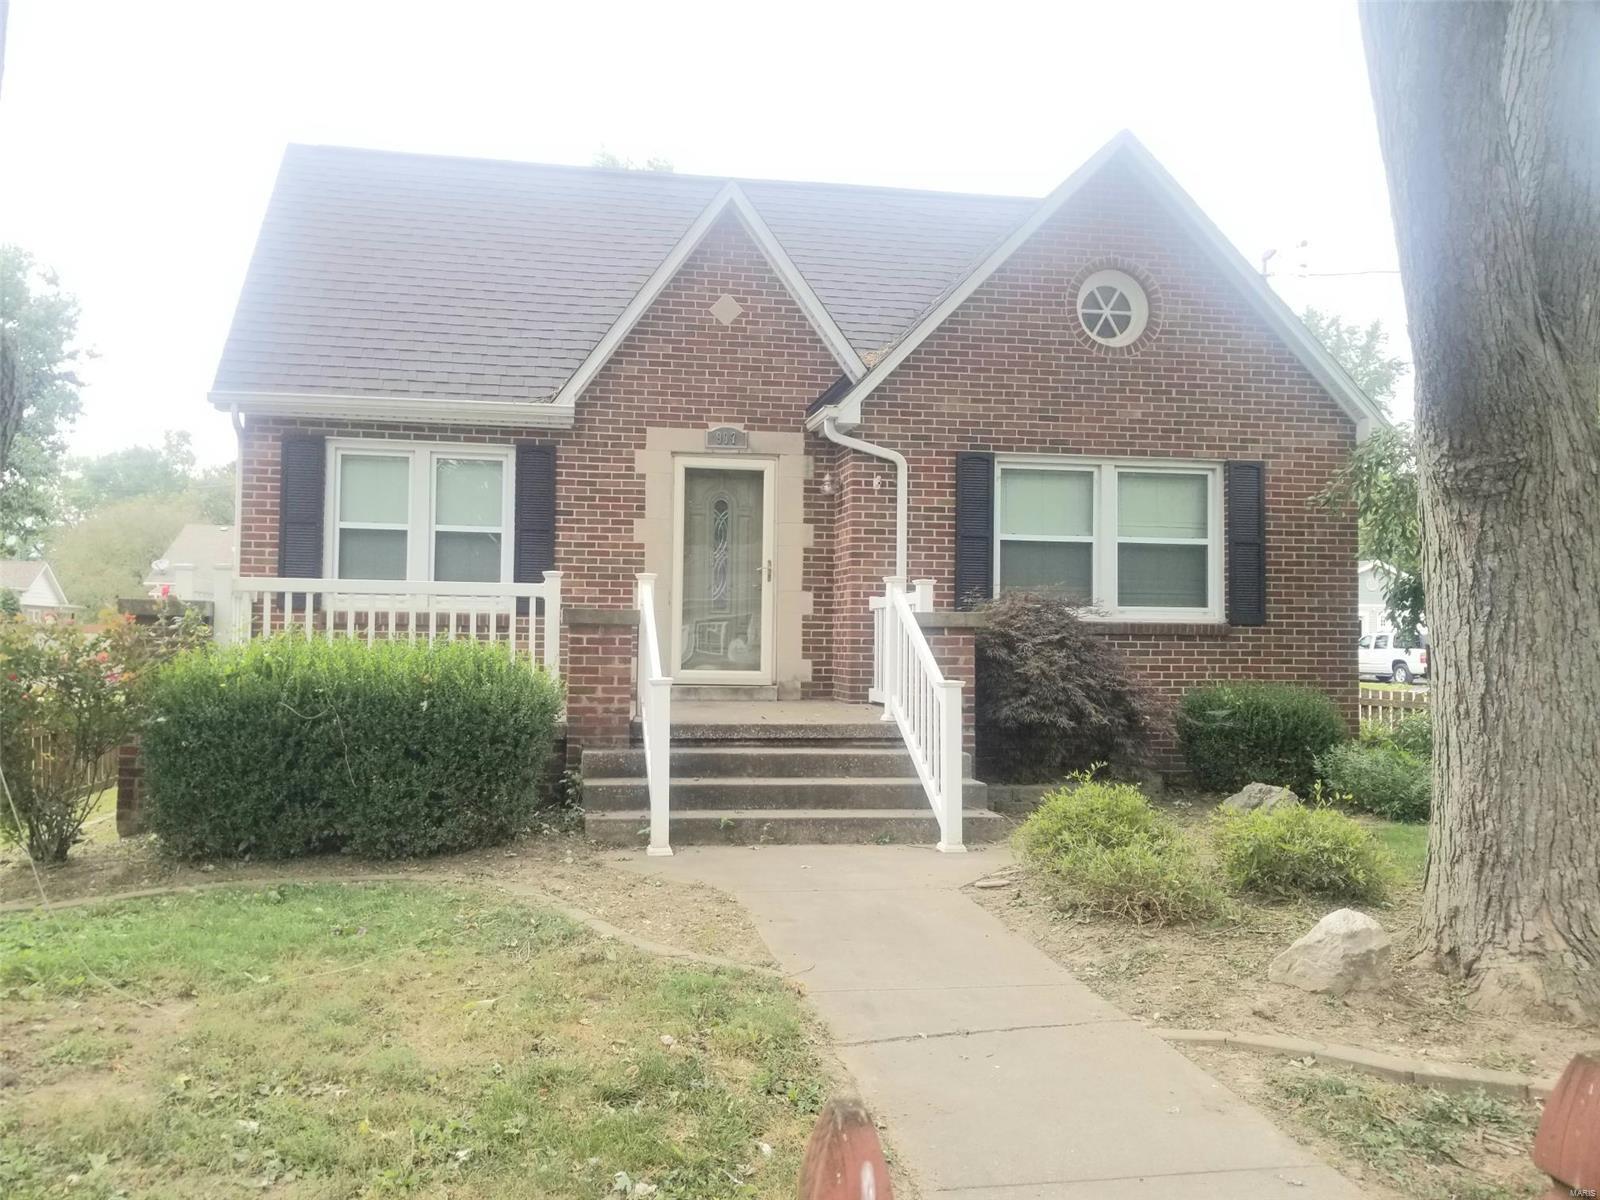 907 W Adams Property Photo - Nashville, IL real estate listing